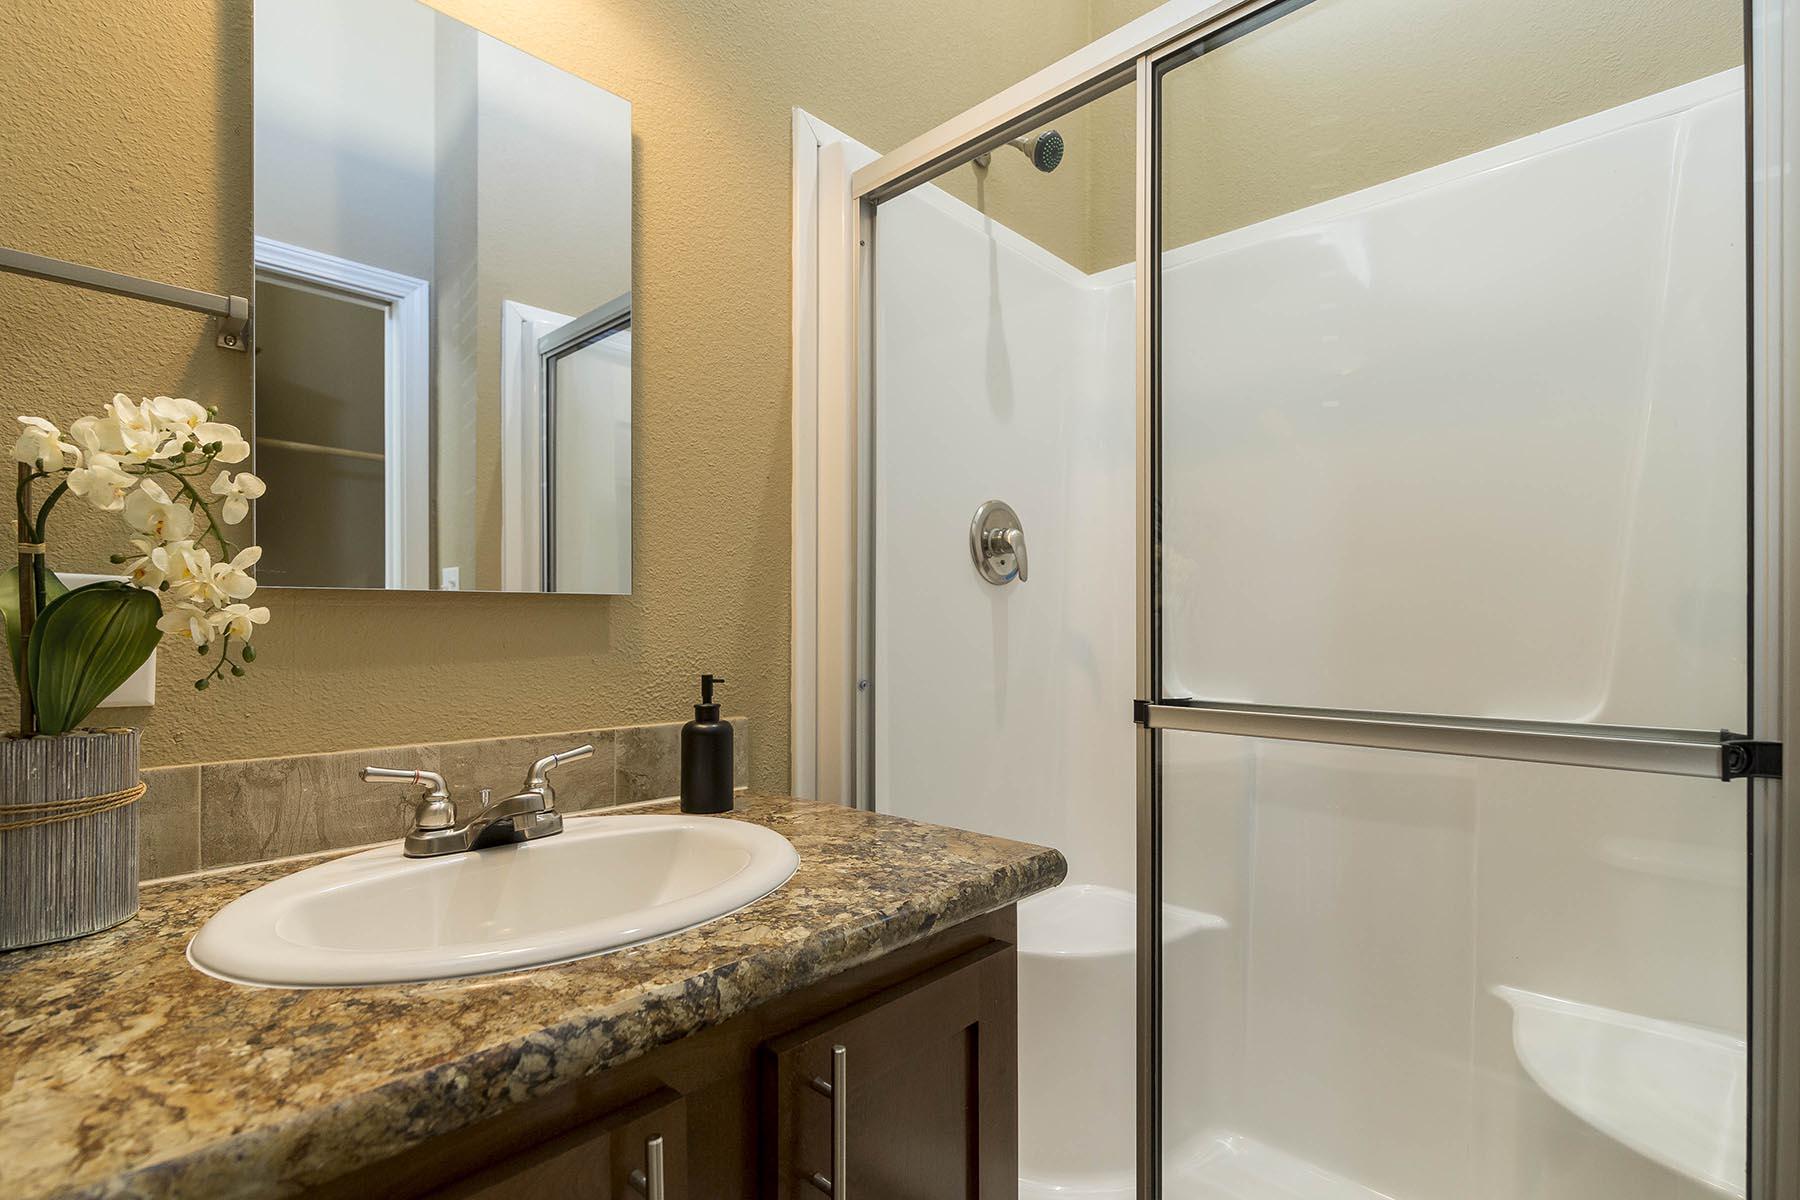 The Baja APH-532 bathroom 2